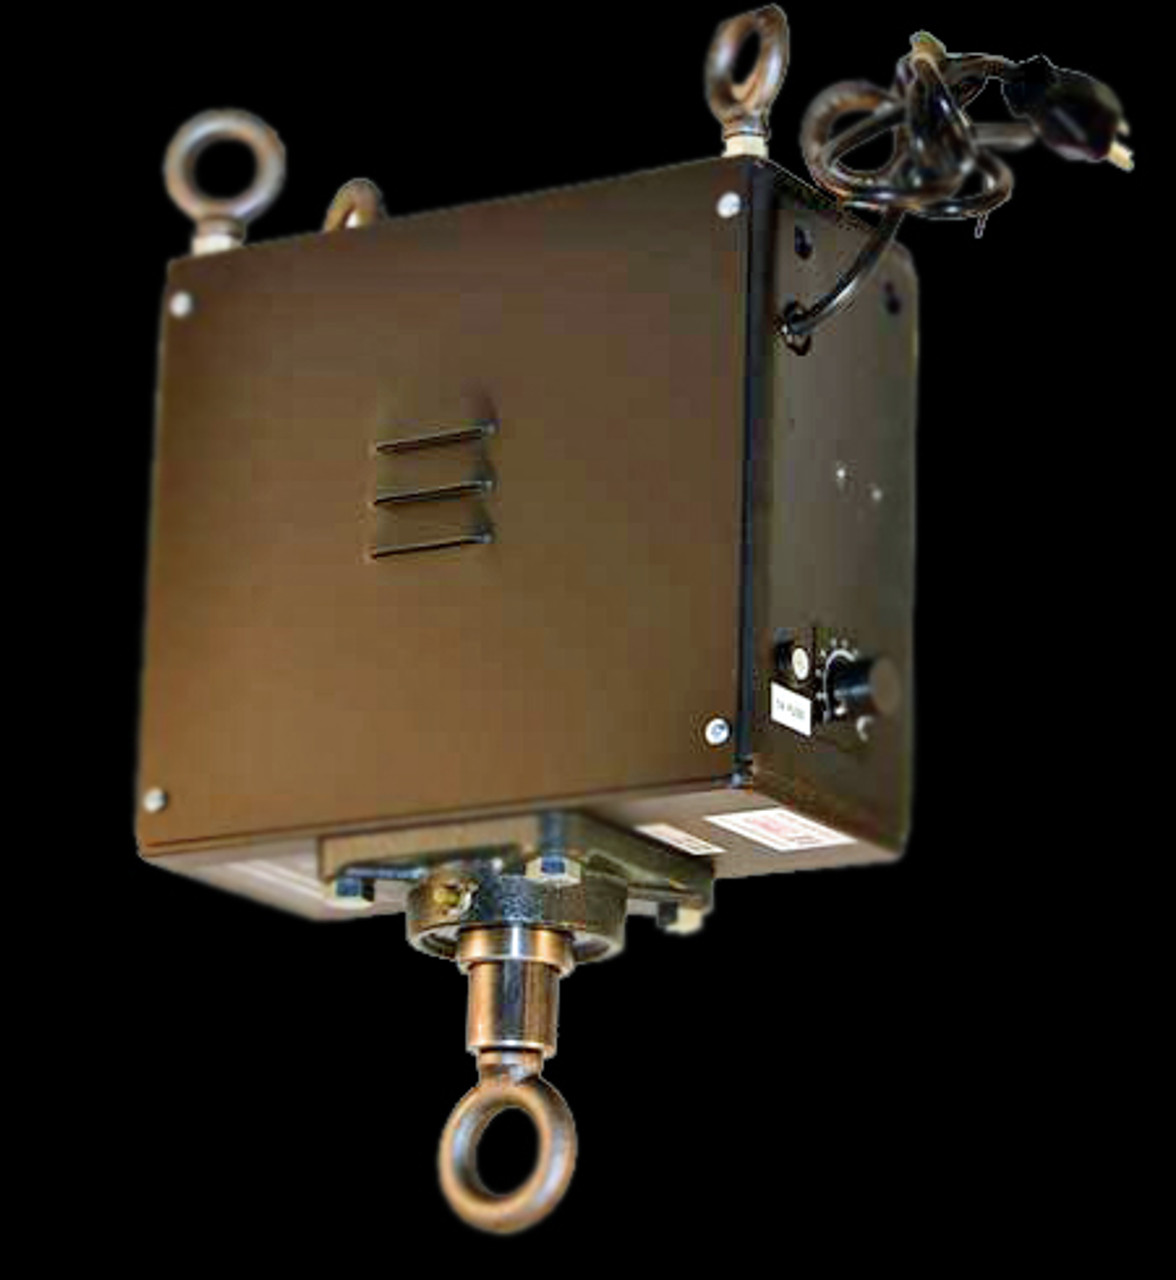 Phantom Dynamics Heavy Duty Mirror Ball Motor / Variable Speed / DMX